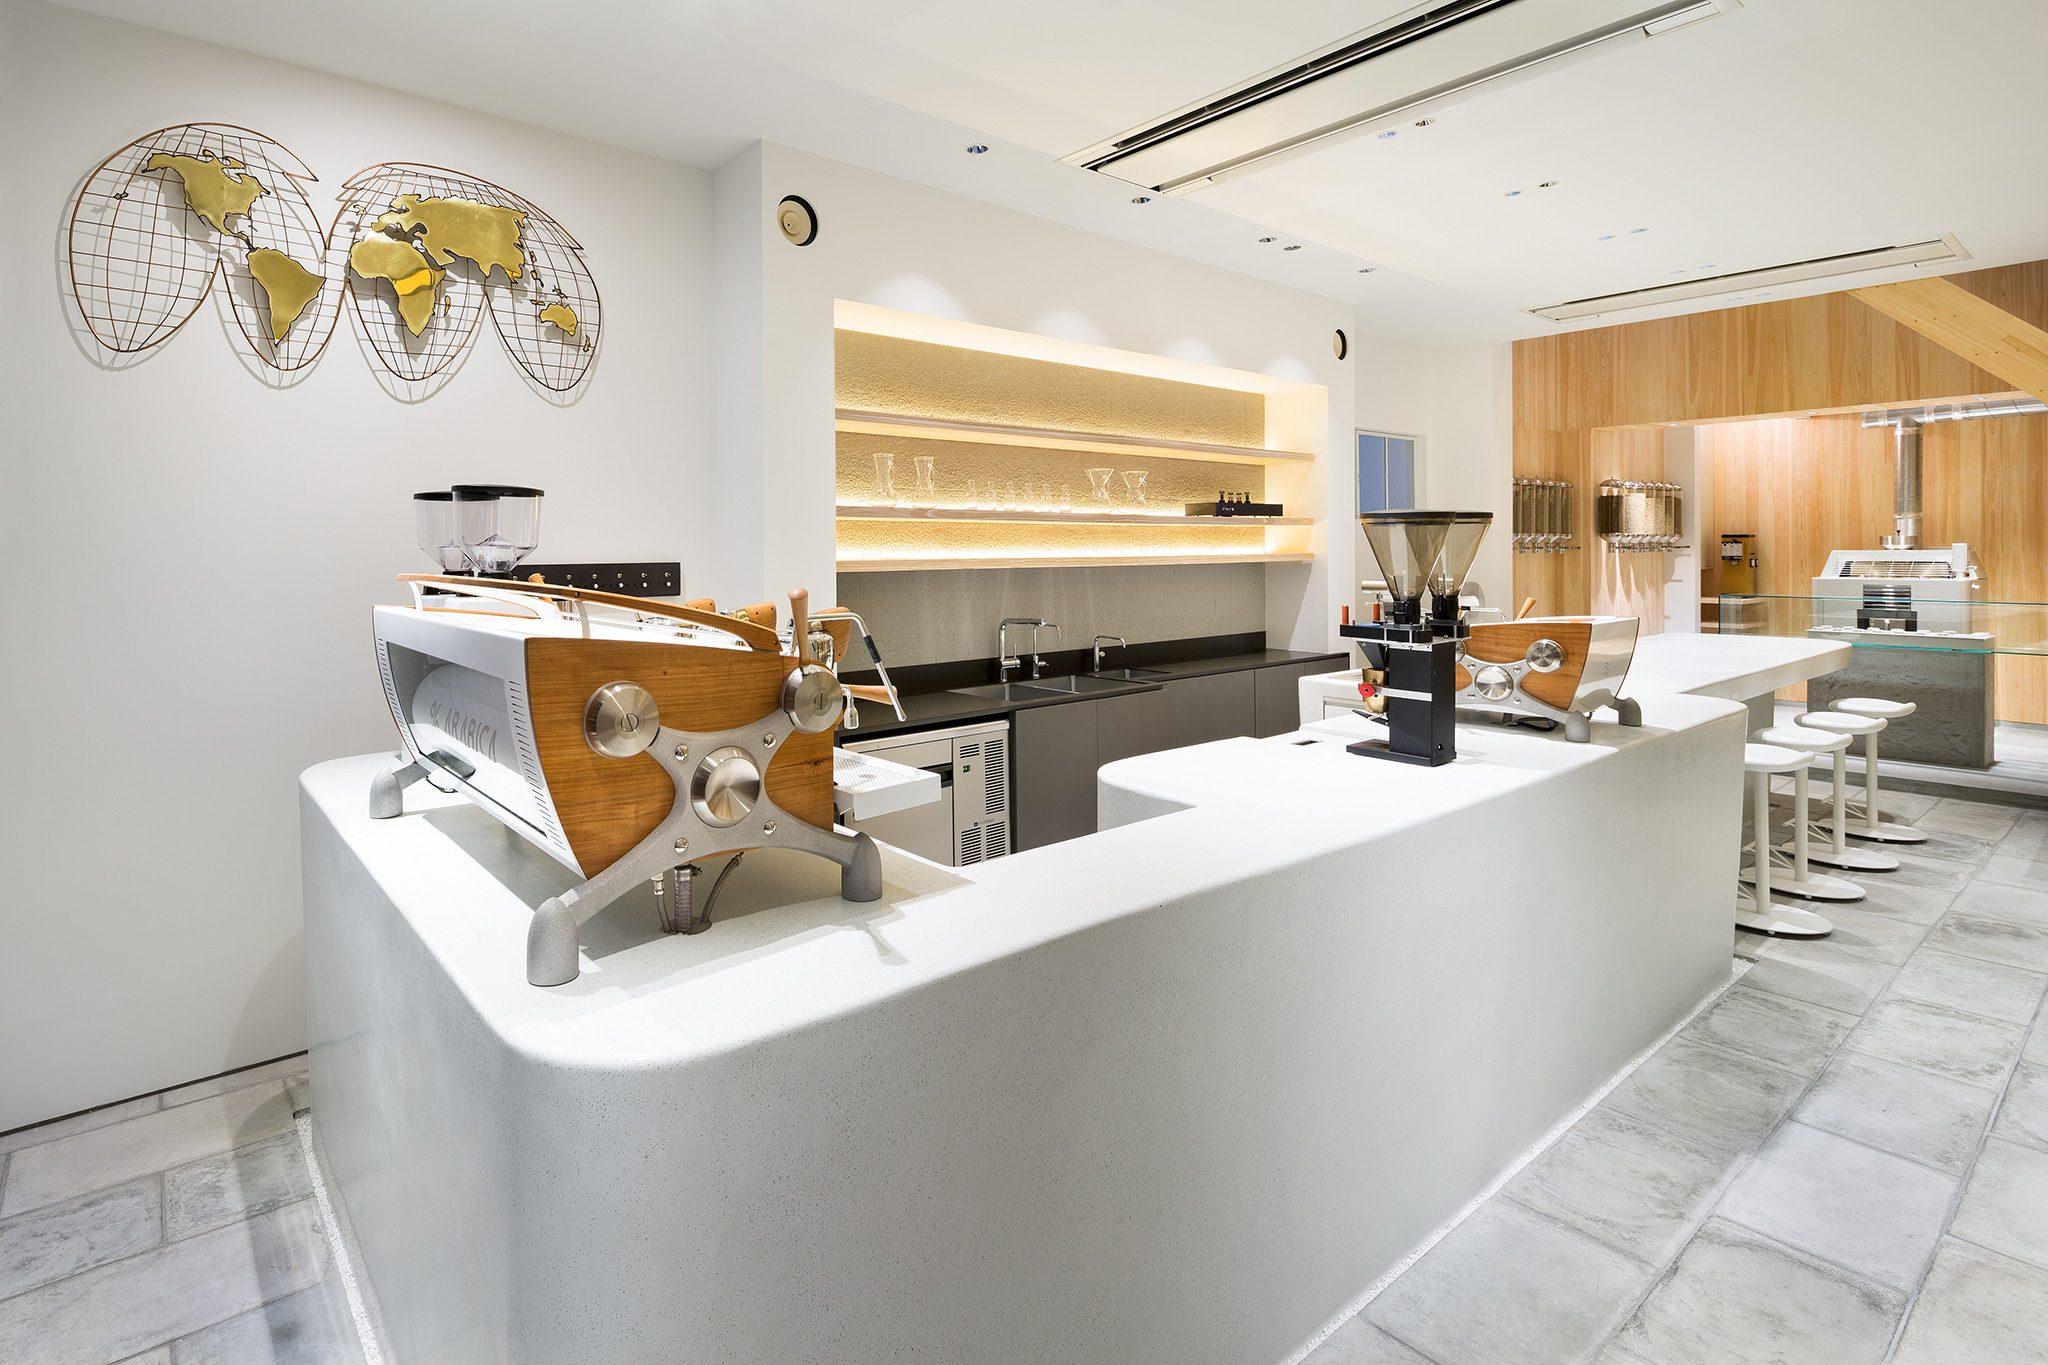 Arabica coffee shop in Kyoto, Japan, will open its first London cafe on Broadway Market in east London